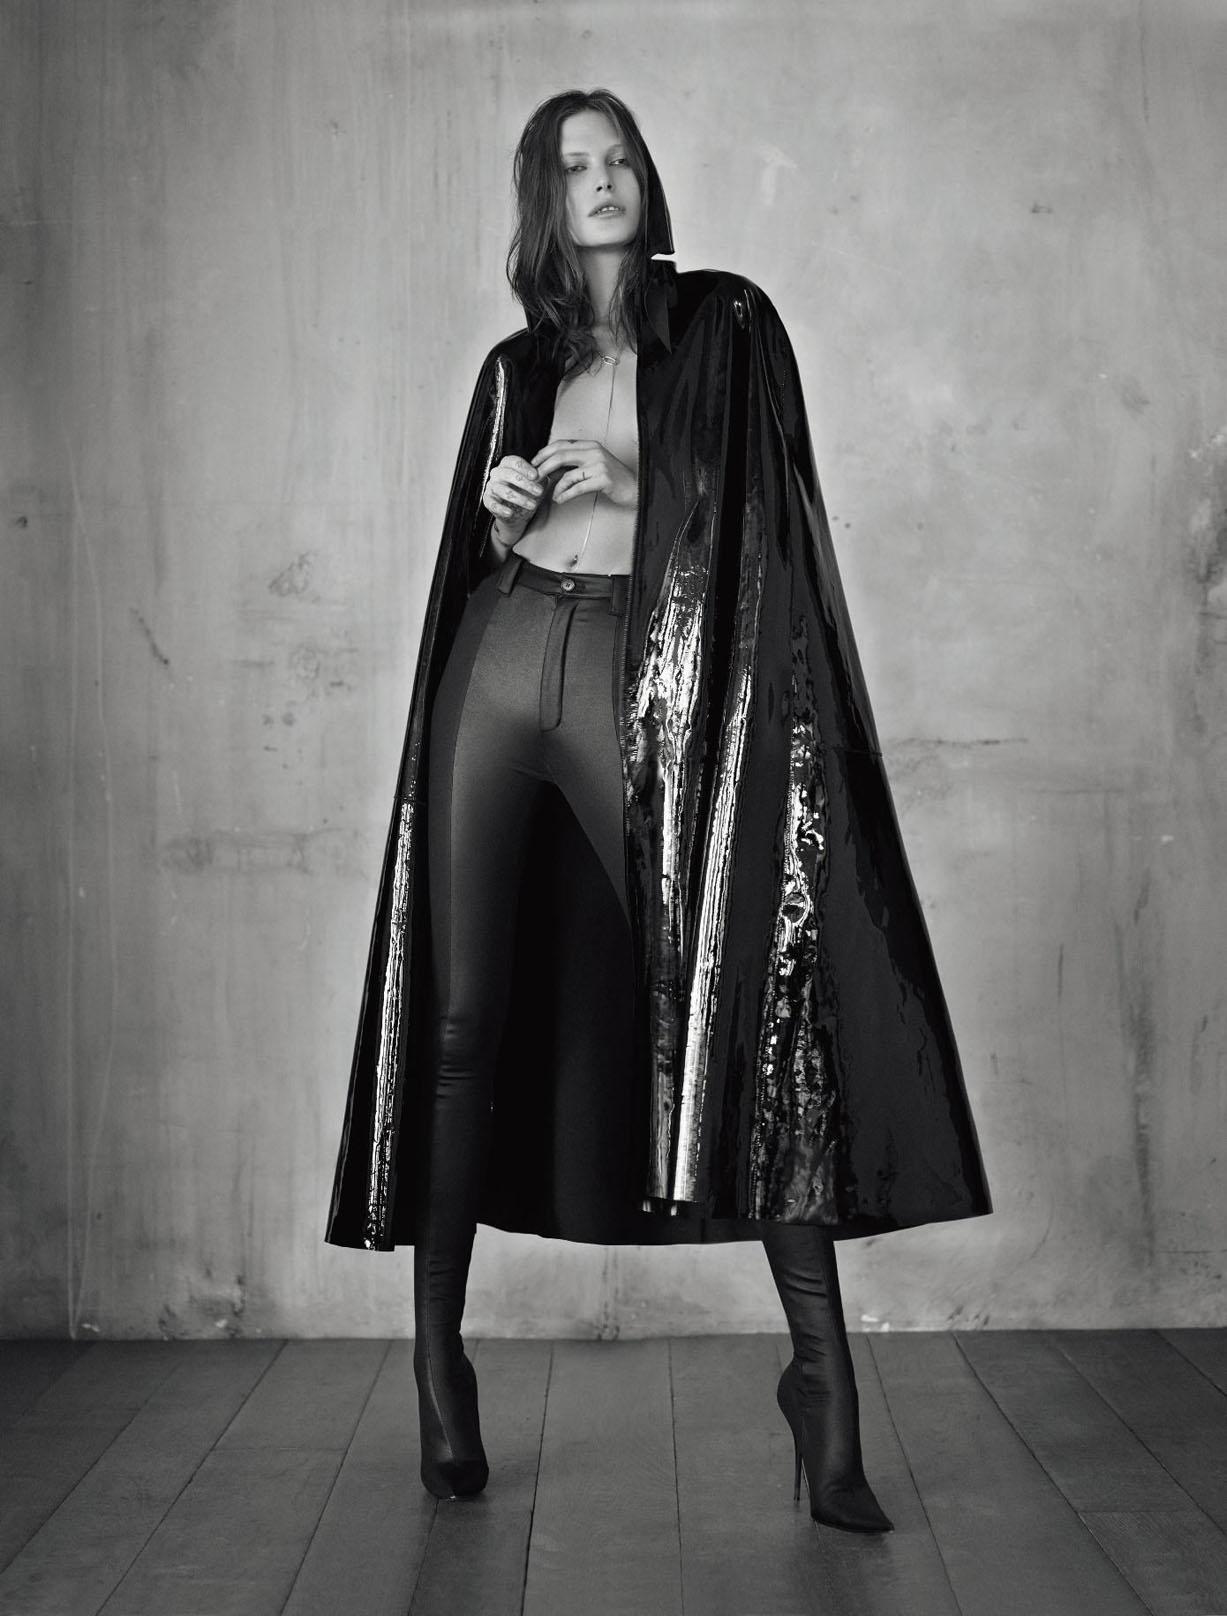 воинственная и сексапильная кожа - Кэтрин Макнил в журнале Numero Magazine february 2017 - Catherine McNeil by Jean-Baptiste Mondino